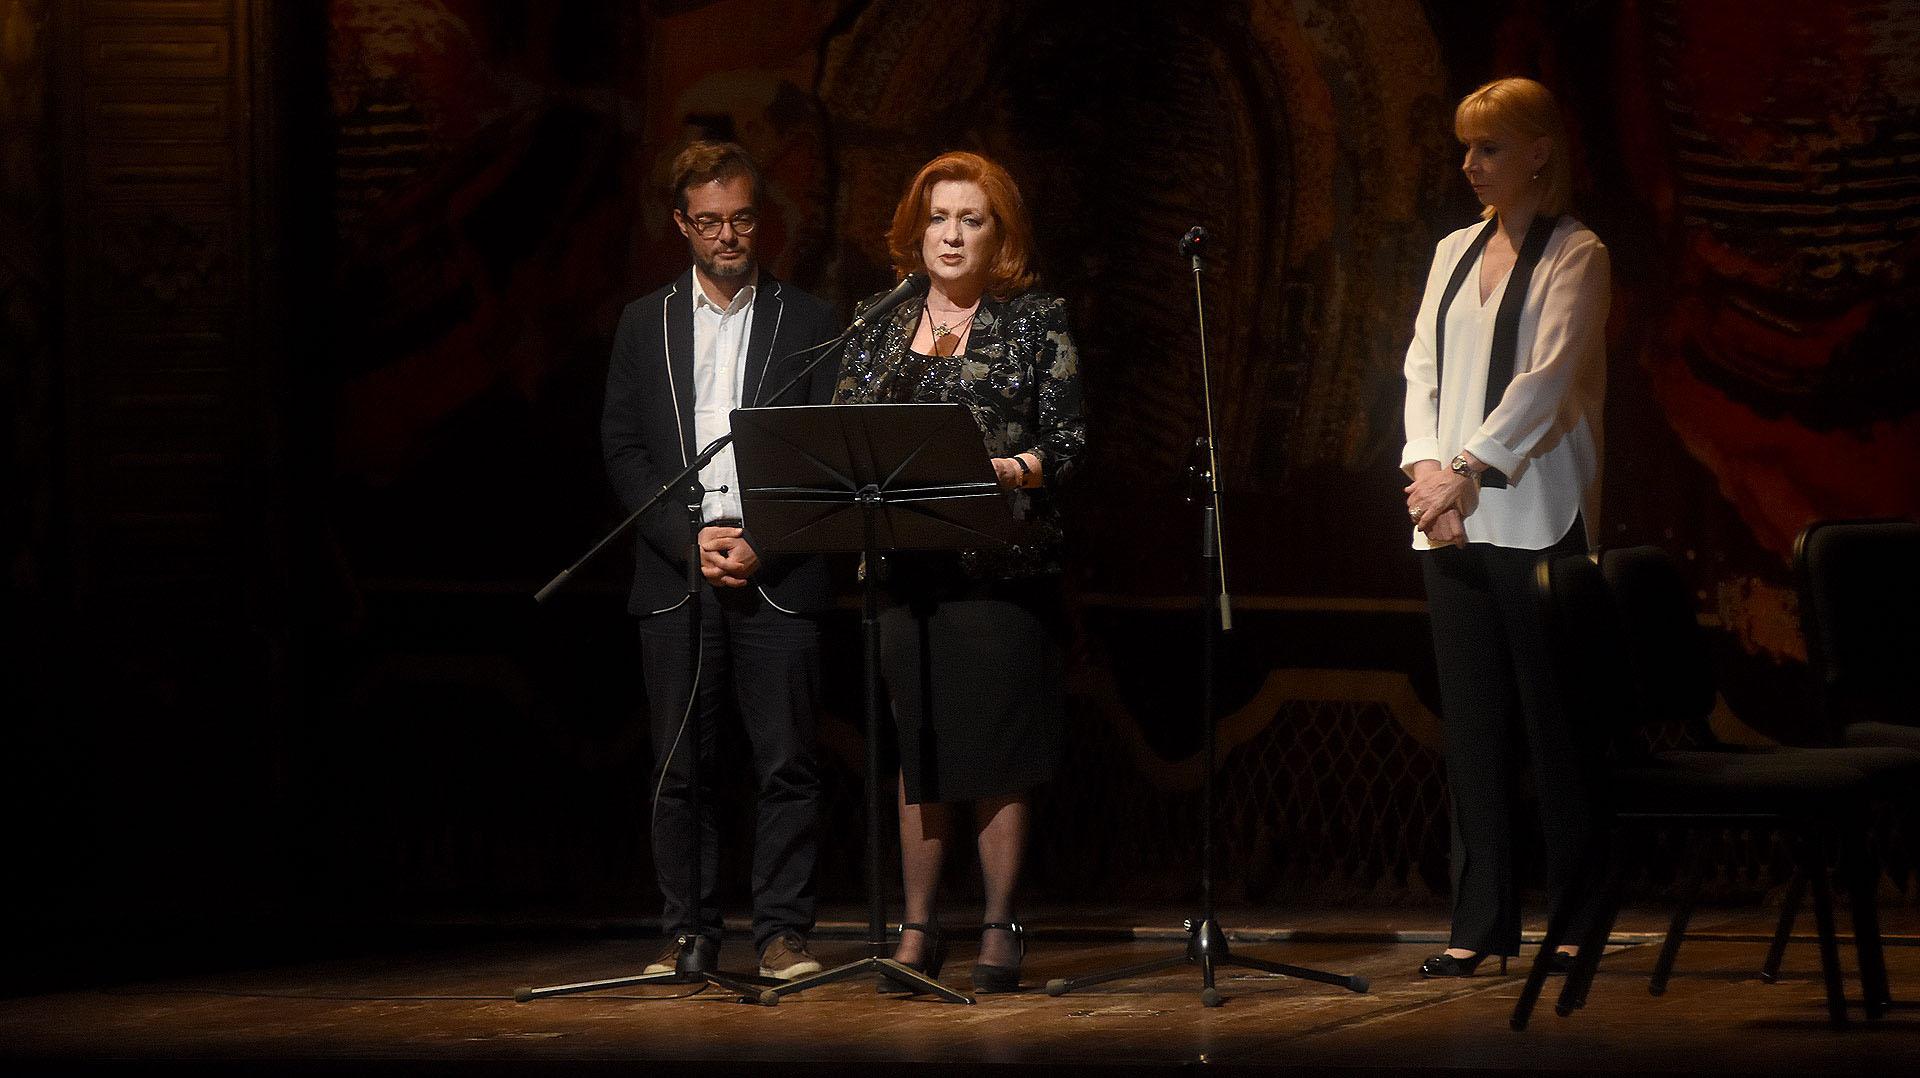 Enrique Avogadro, Teresa González Fernández y María Victoria Alcaraz